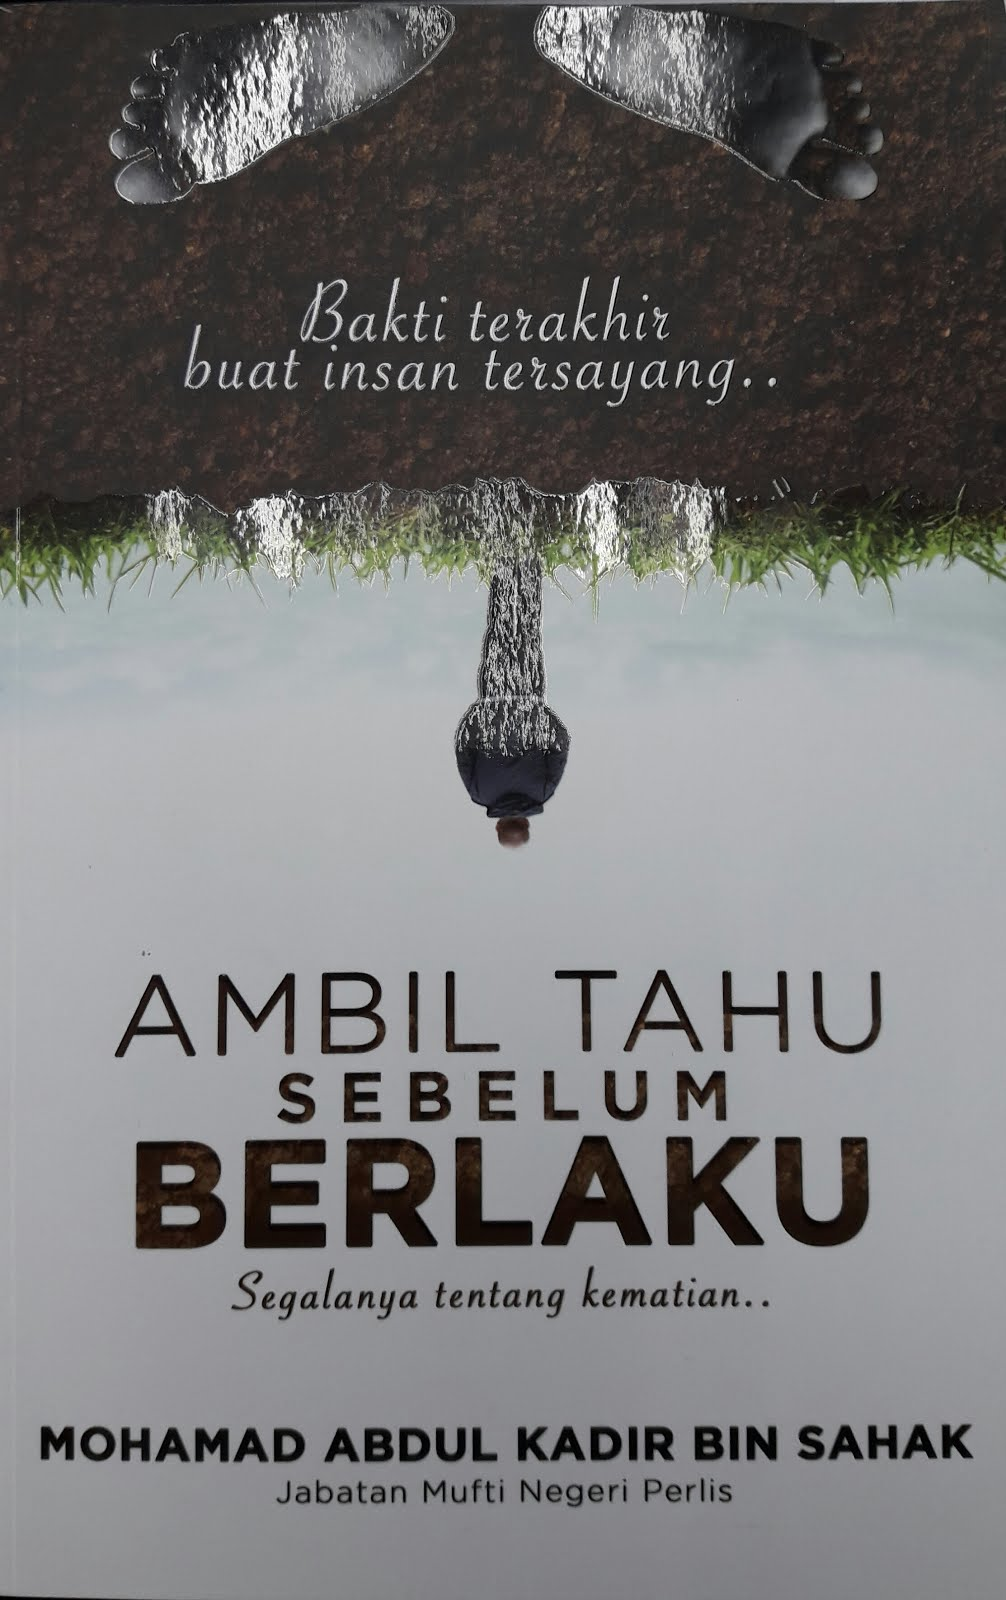 Buku terbaru Bin Sahak